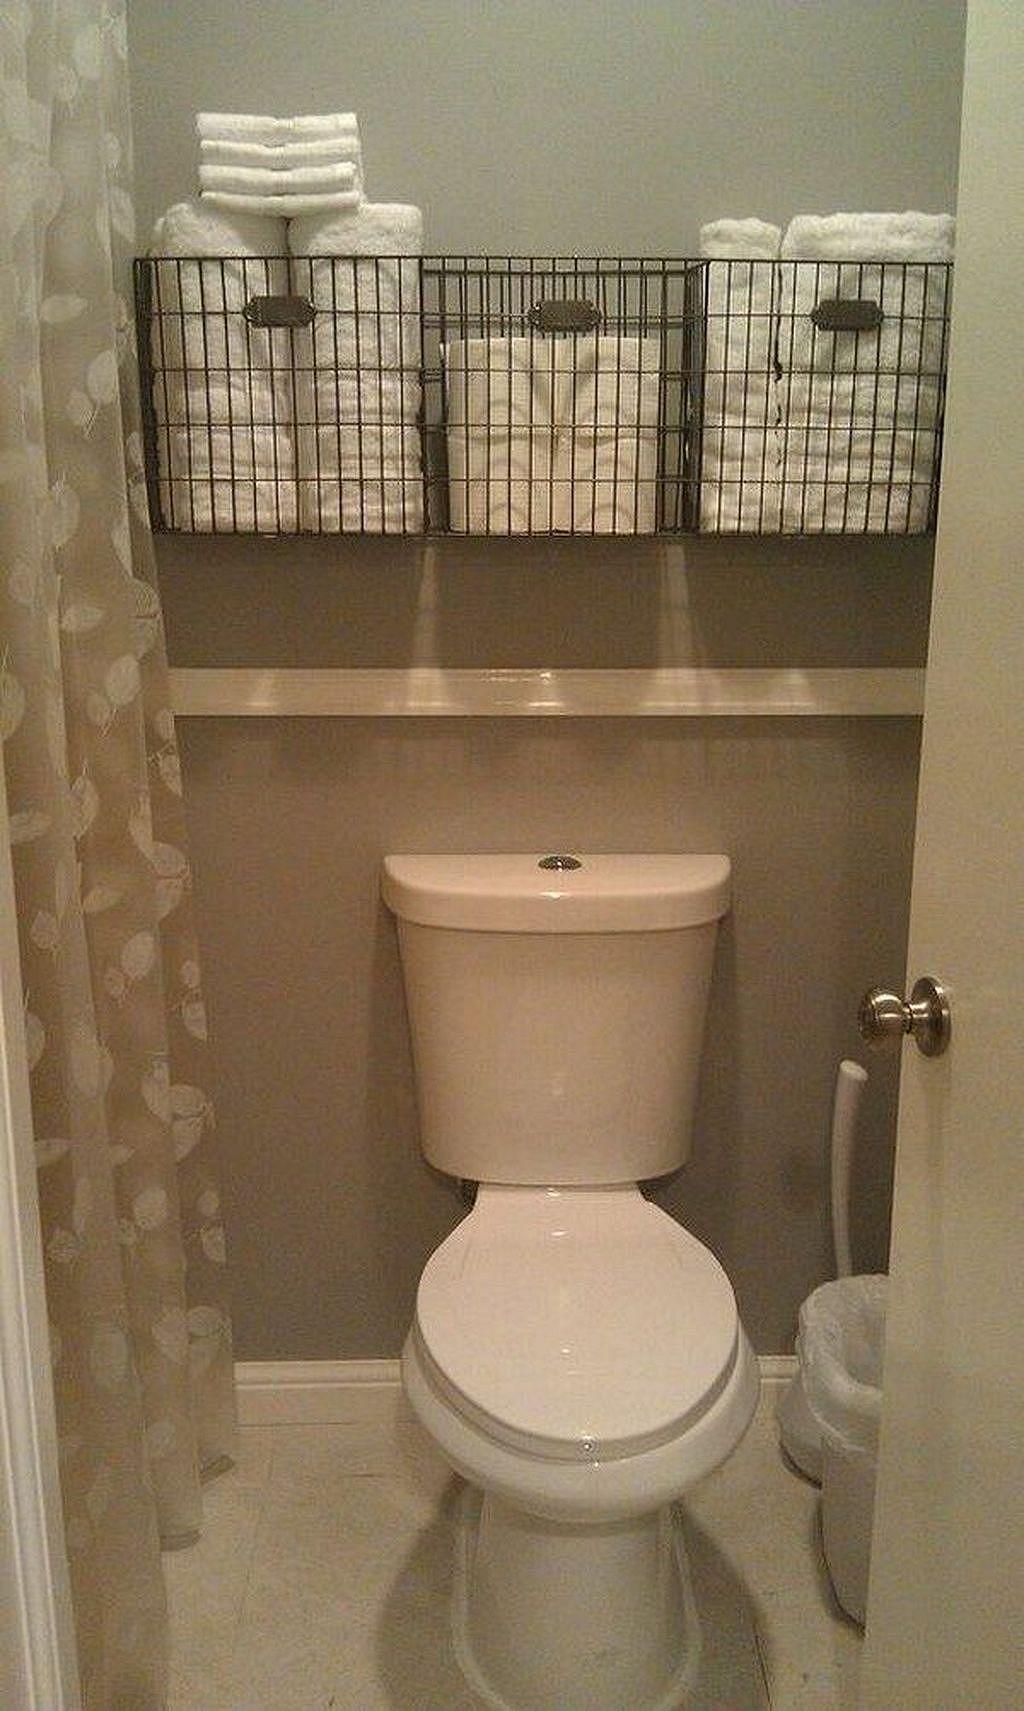 40 Towel Storage For Small Bathroom Ideas 8 Small Bathroom Storage Rv Storage Organization Toilet Storage